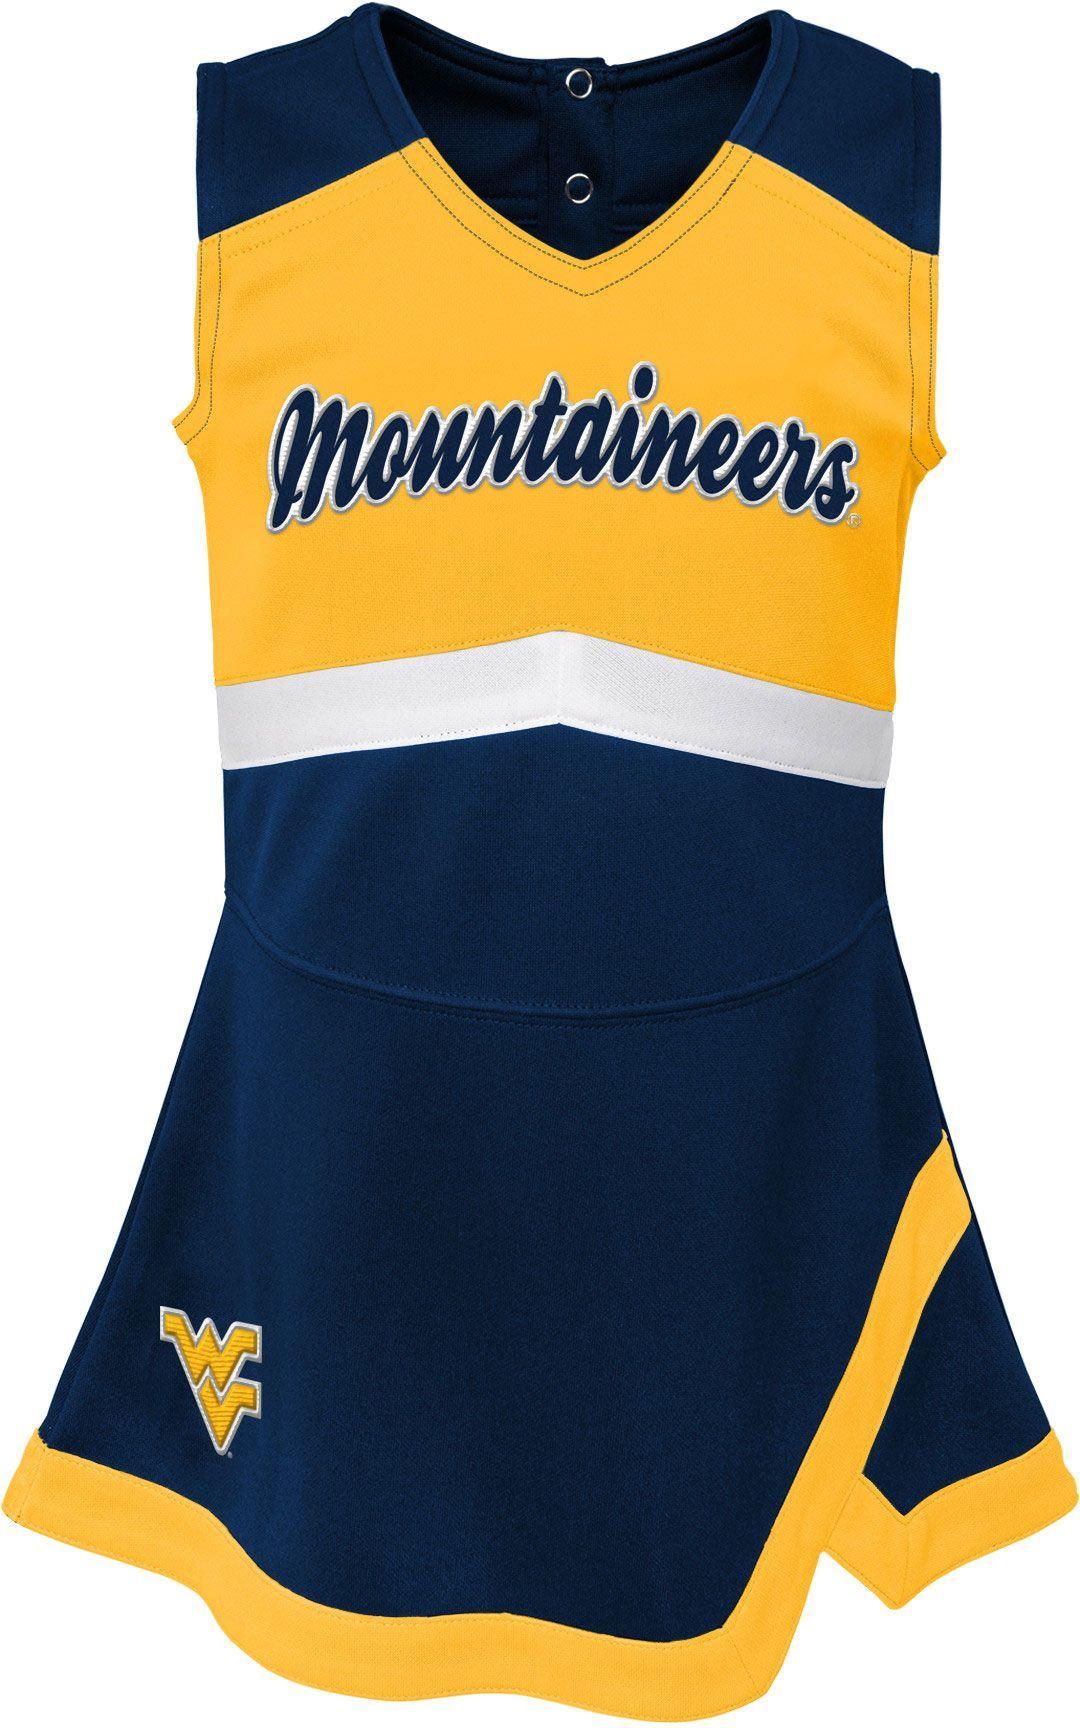 Gen2 Toddler Girls West Virginia Mountaineers Blue Cheer Captain 2 Piece Jumper Dress Girl S Size 4t In 2020 Blue Cheer Cheer Captain Jumper Dress